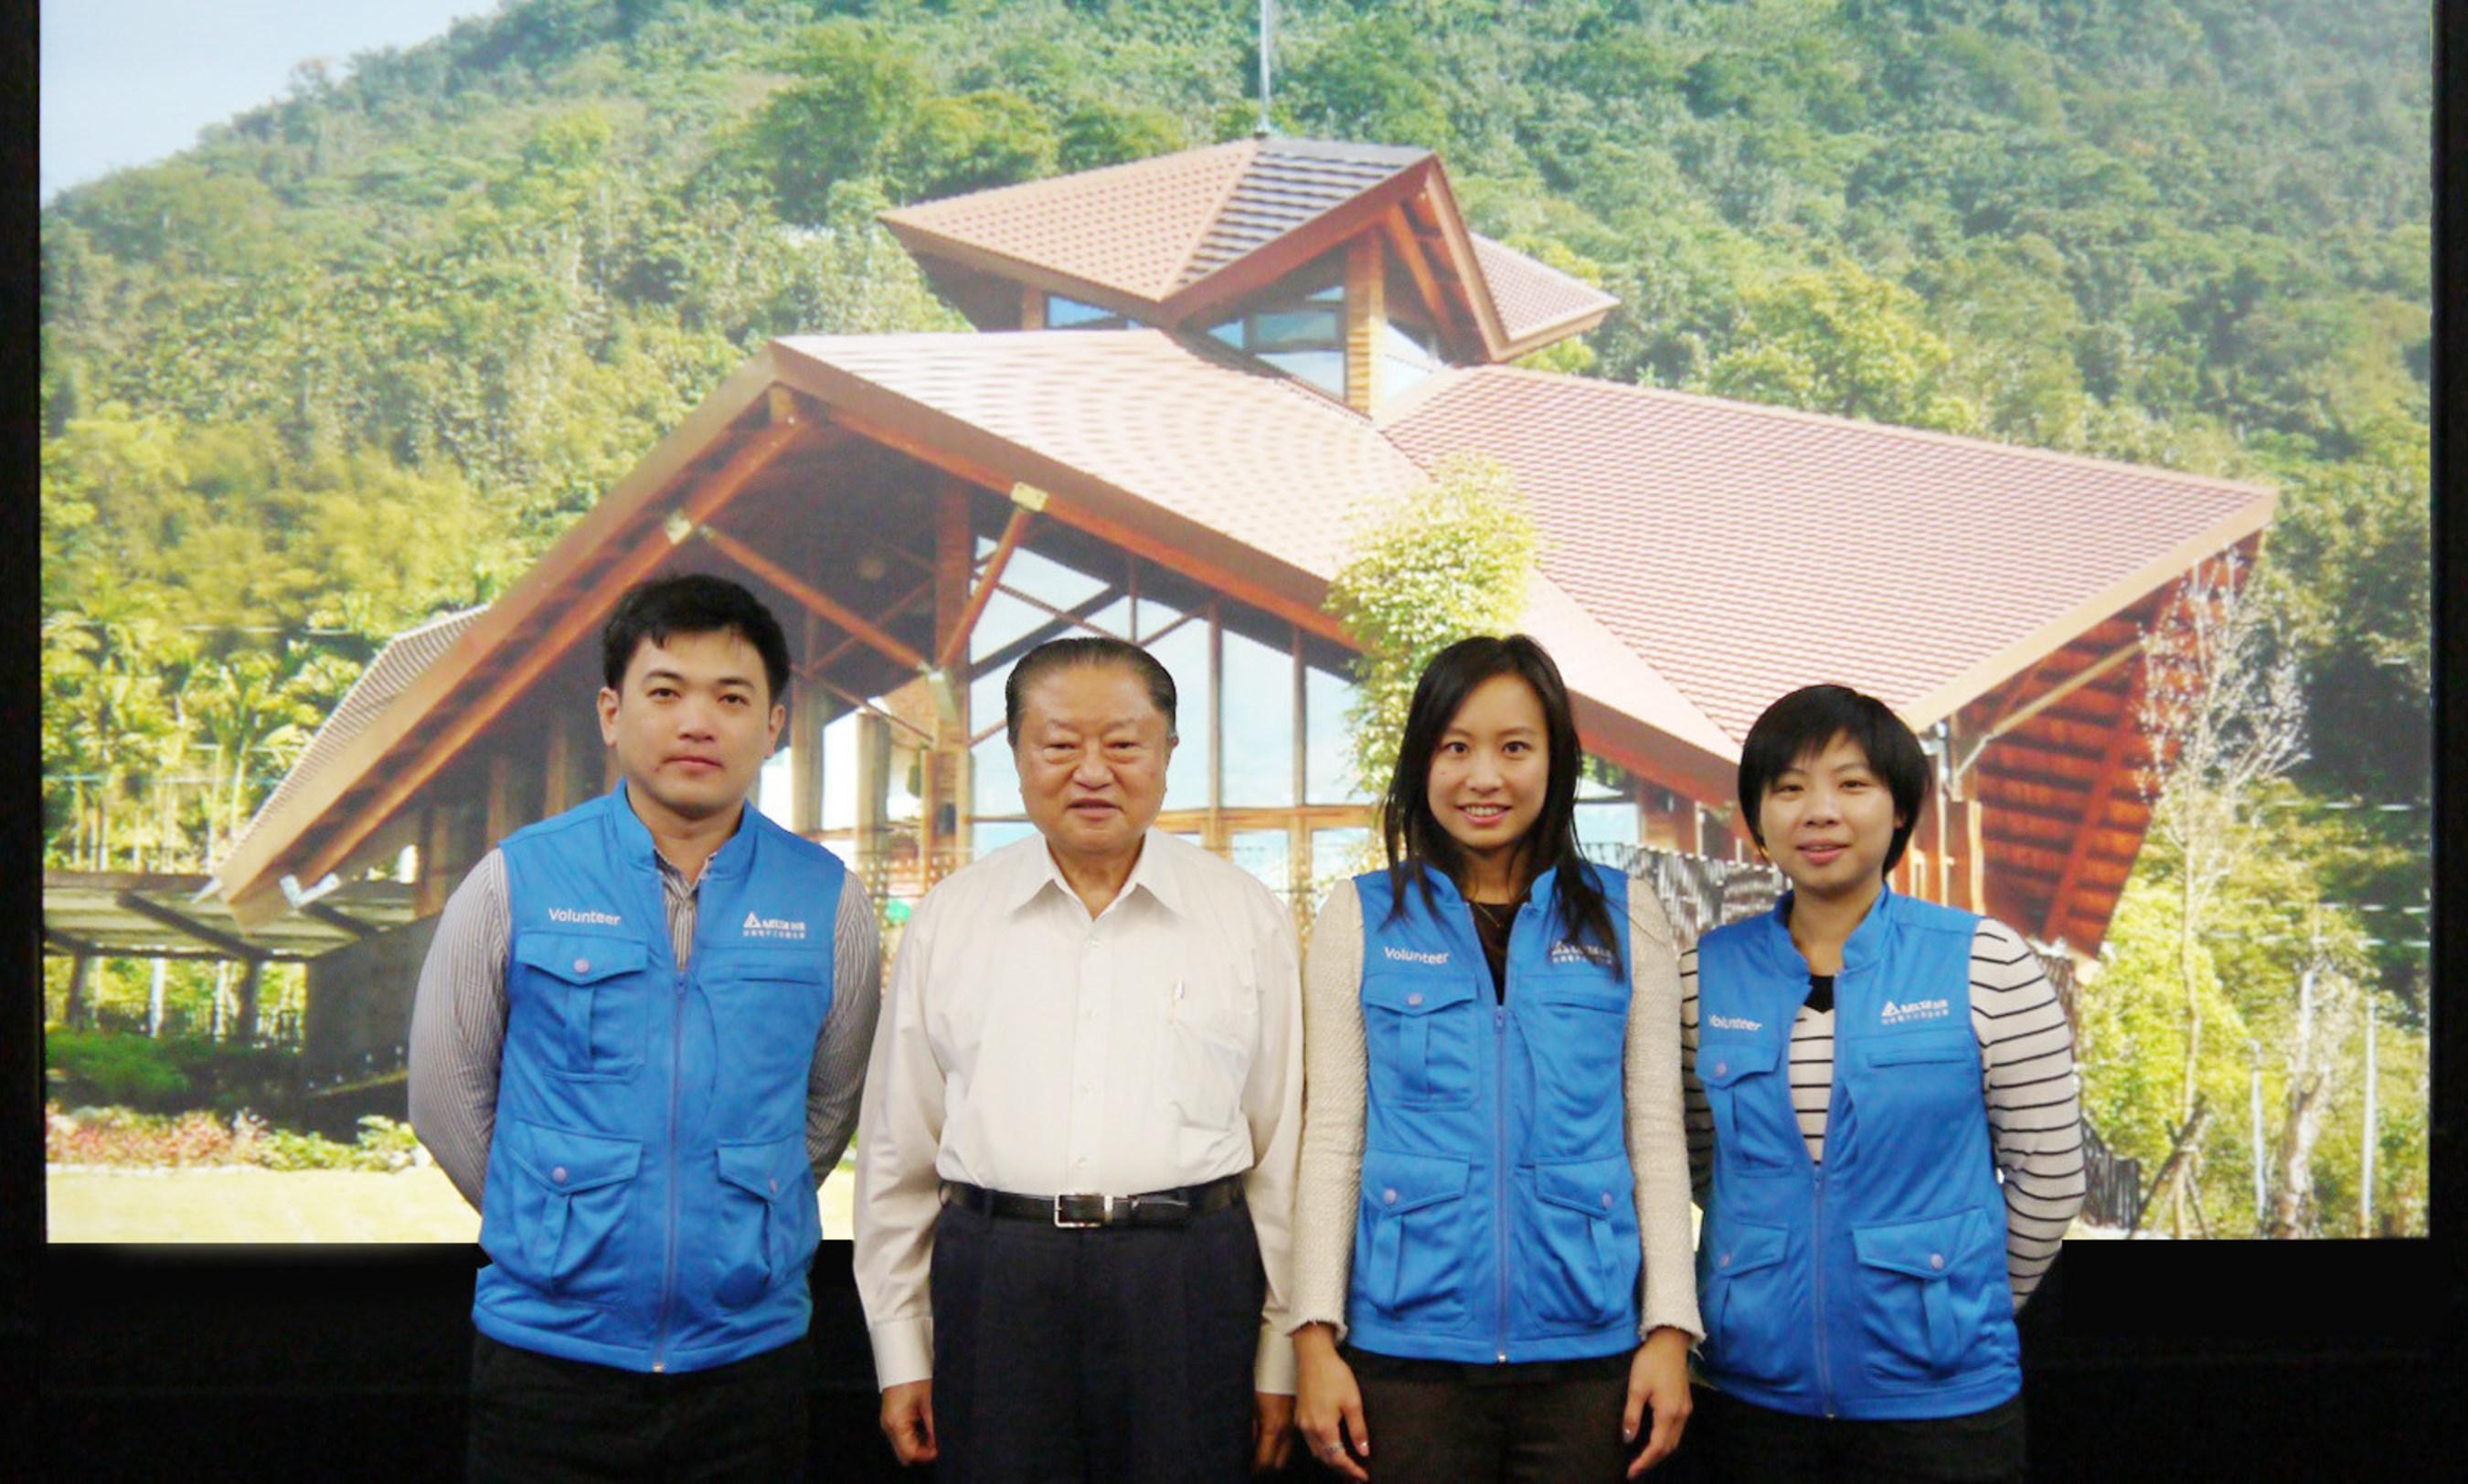 Delta Electronics Foundation kündigt auf UN-Klimakonferenz Taiwans erstes